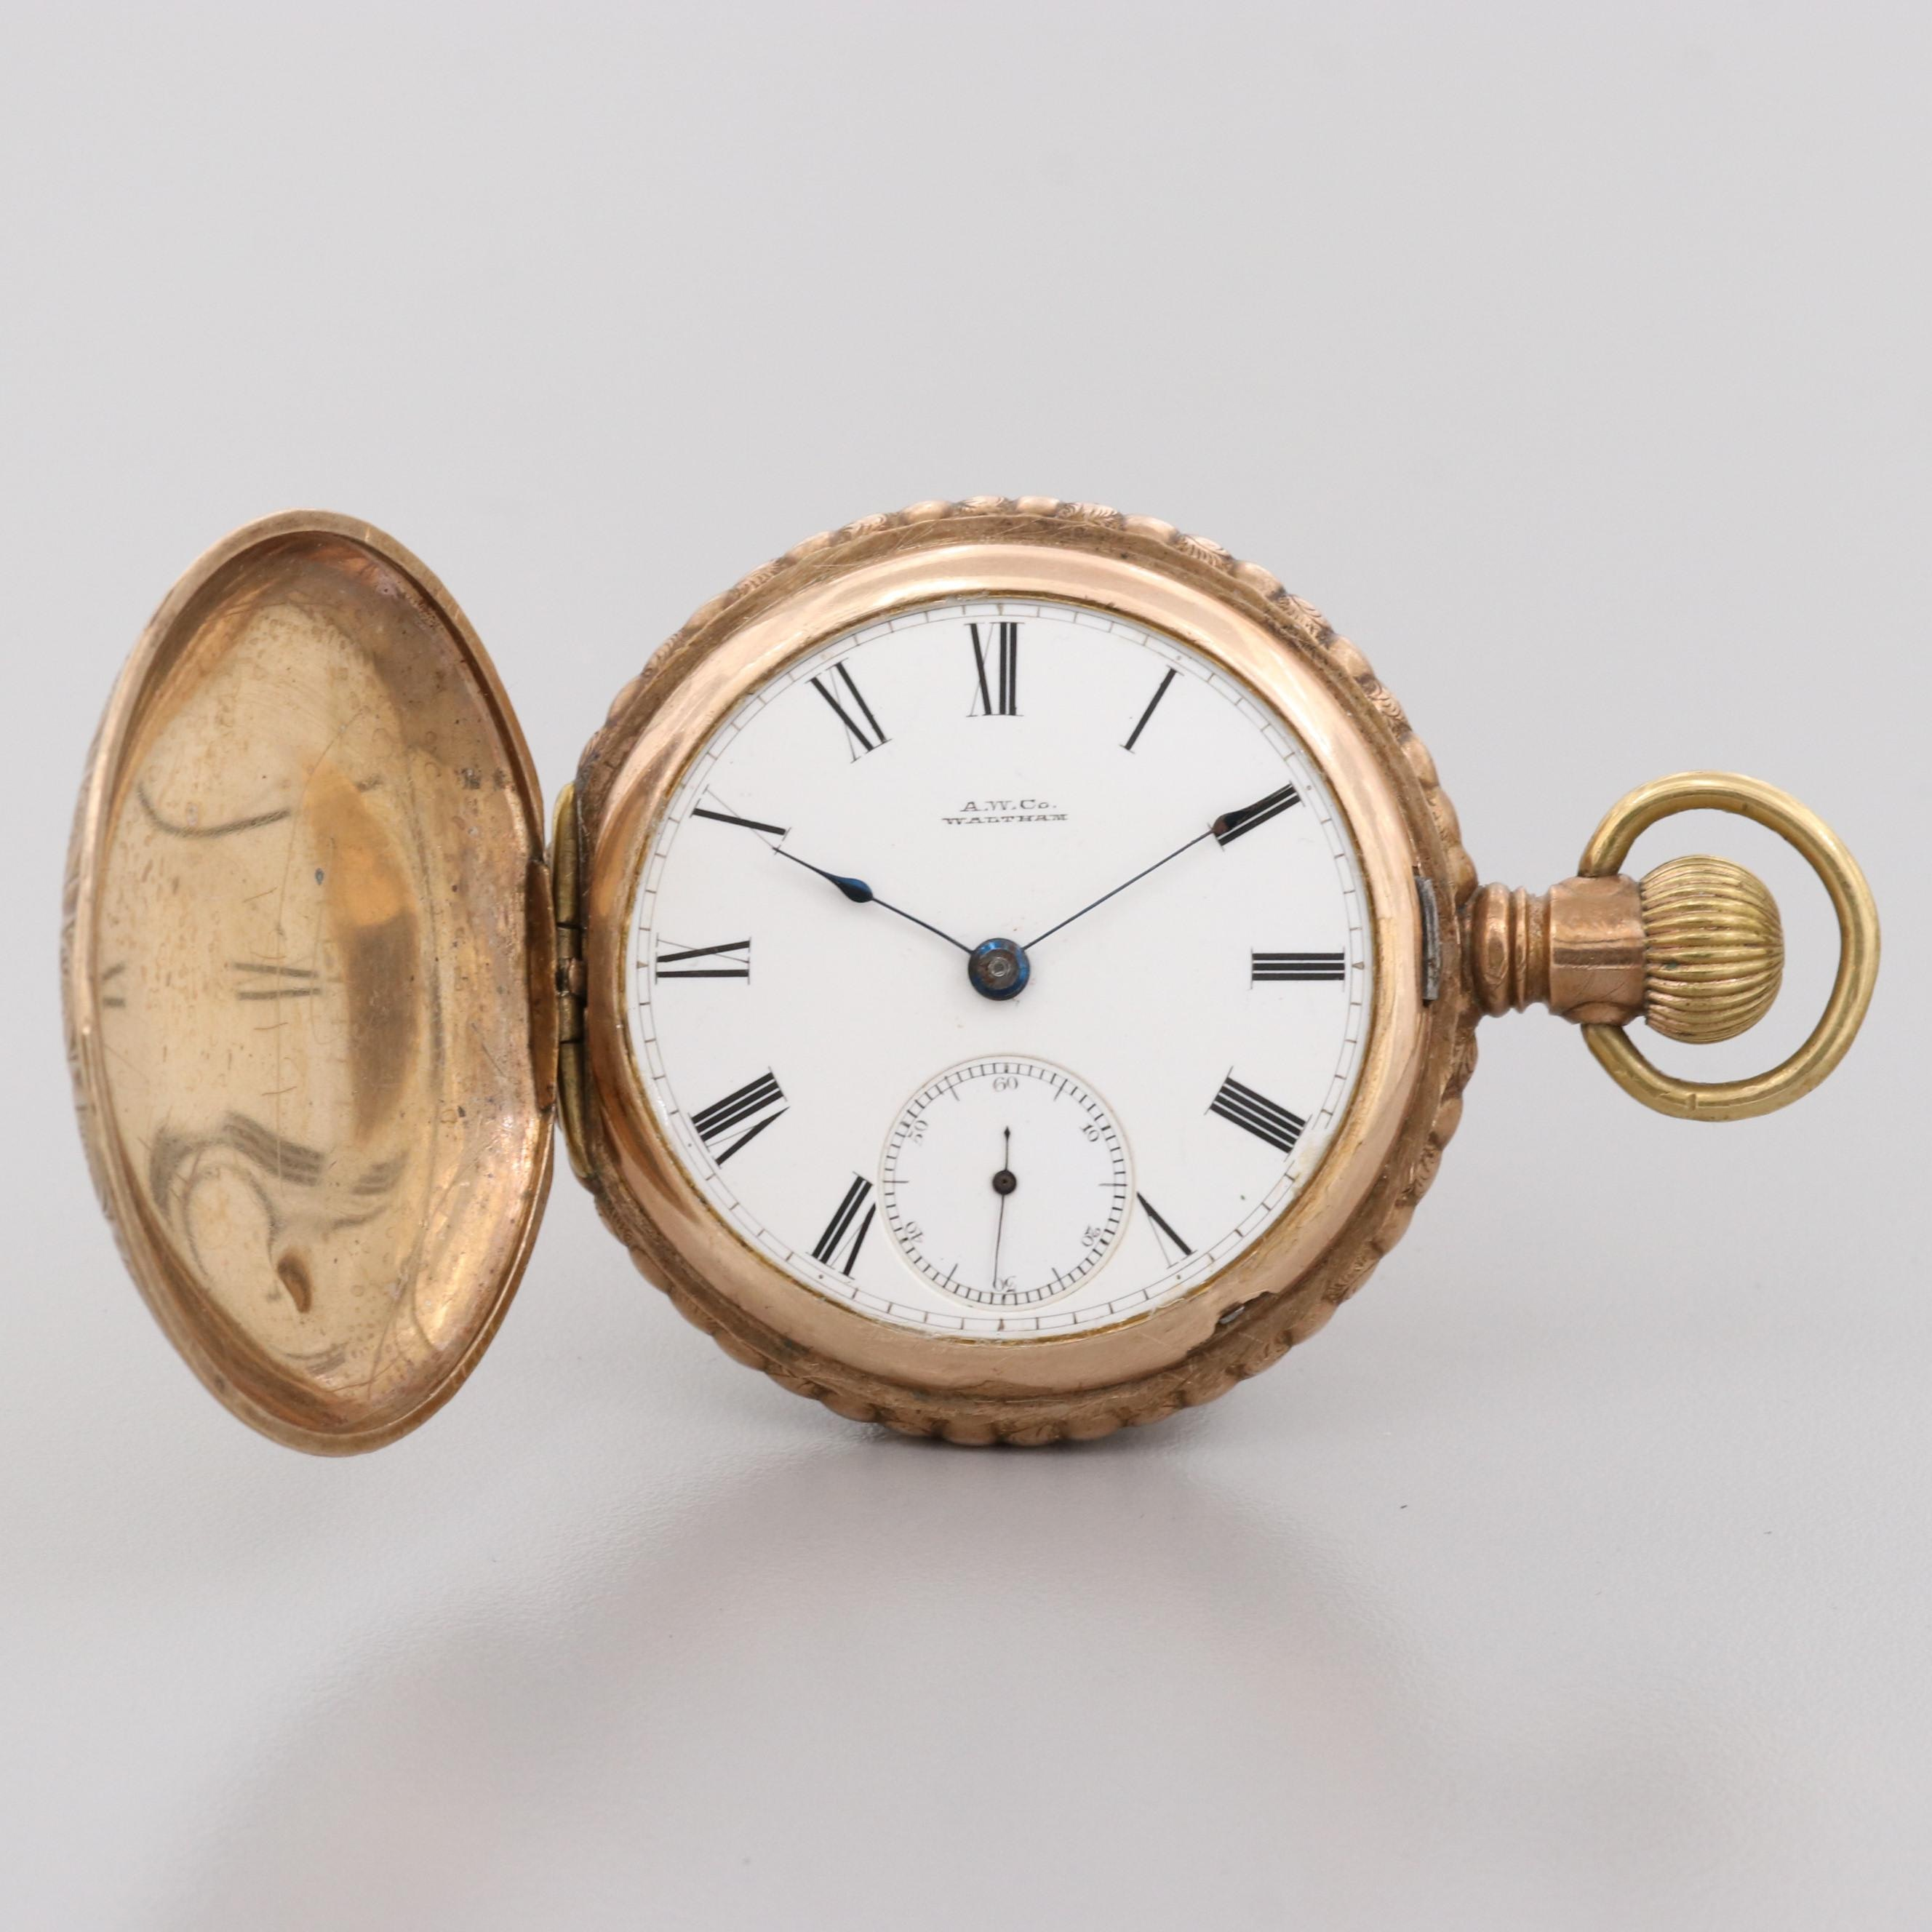 Waltham Gold Filled Pocket Watch, 1884